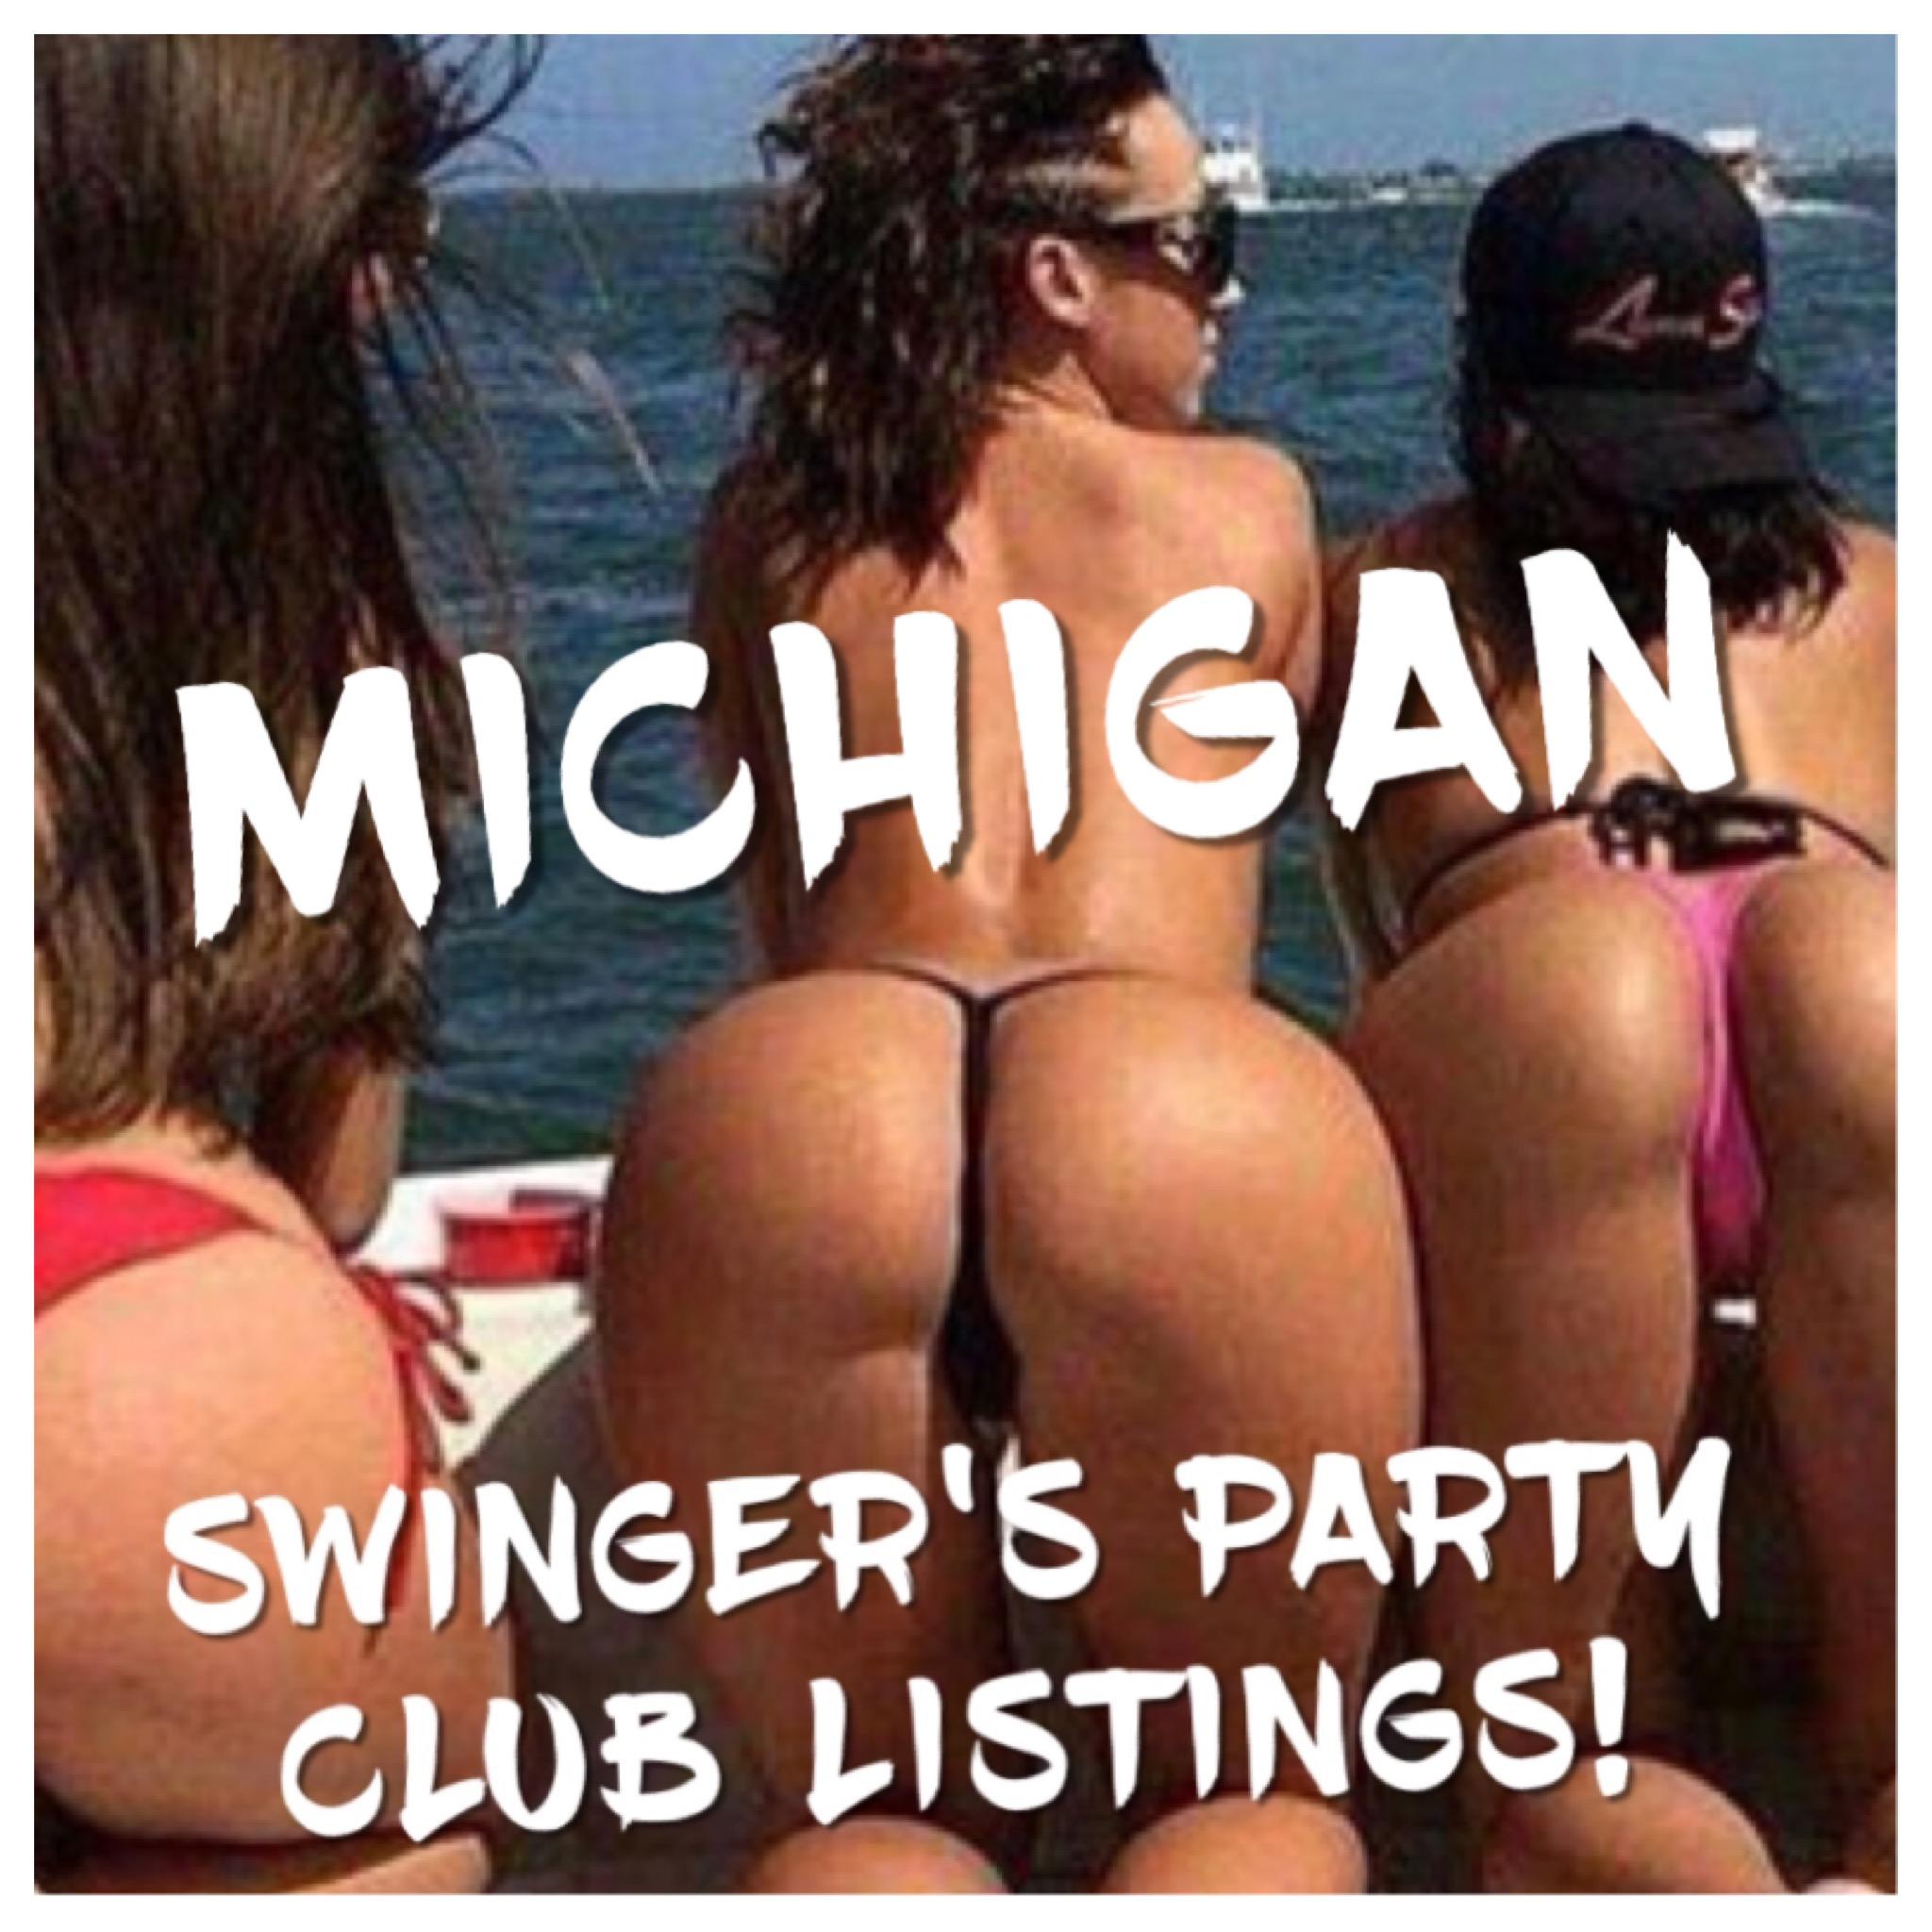 Michgian swinger clubs